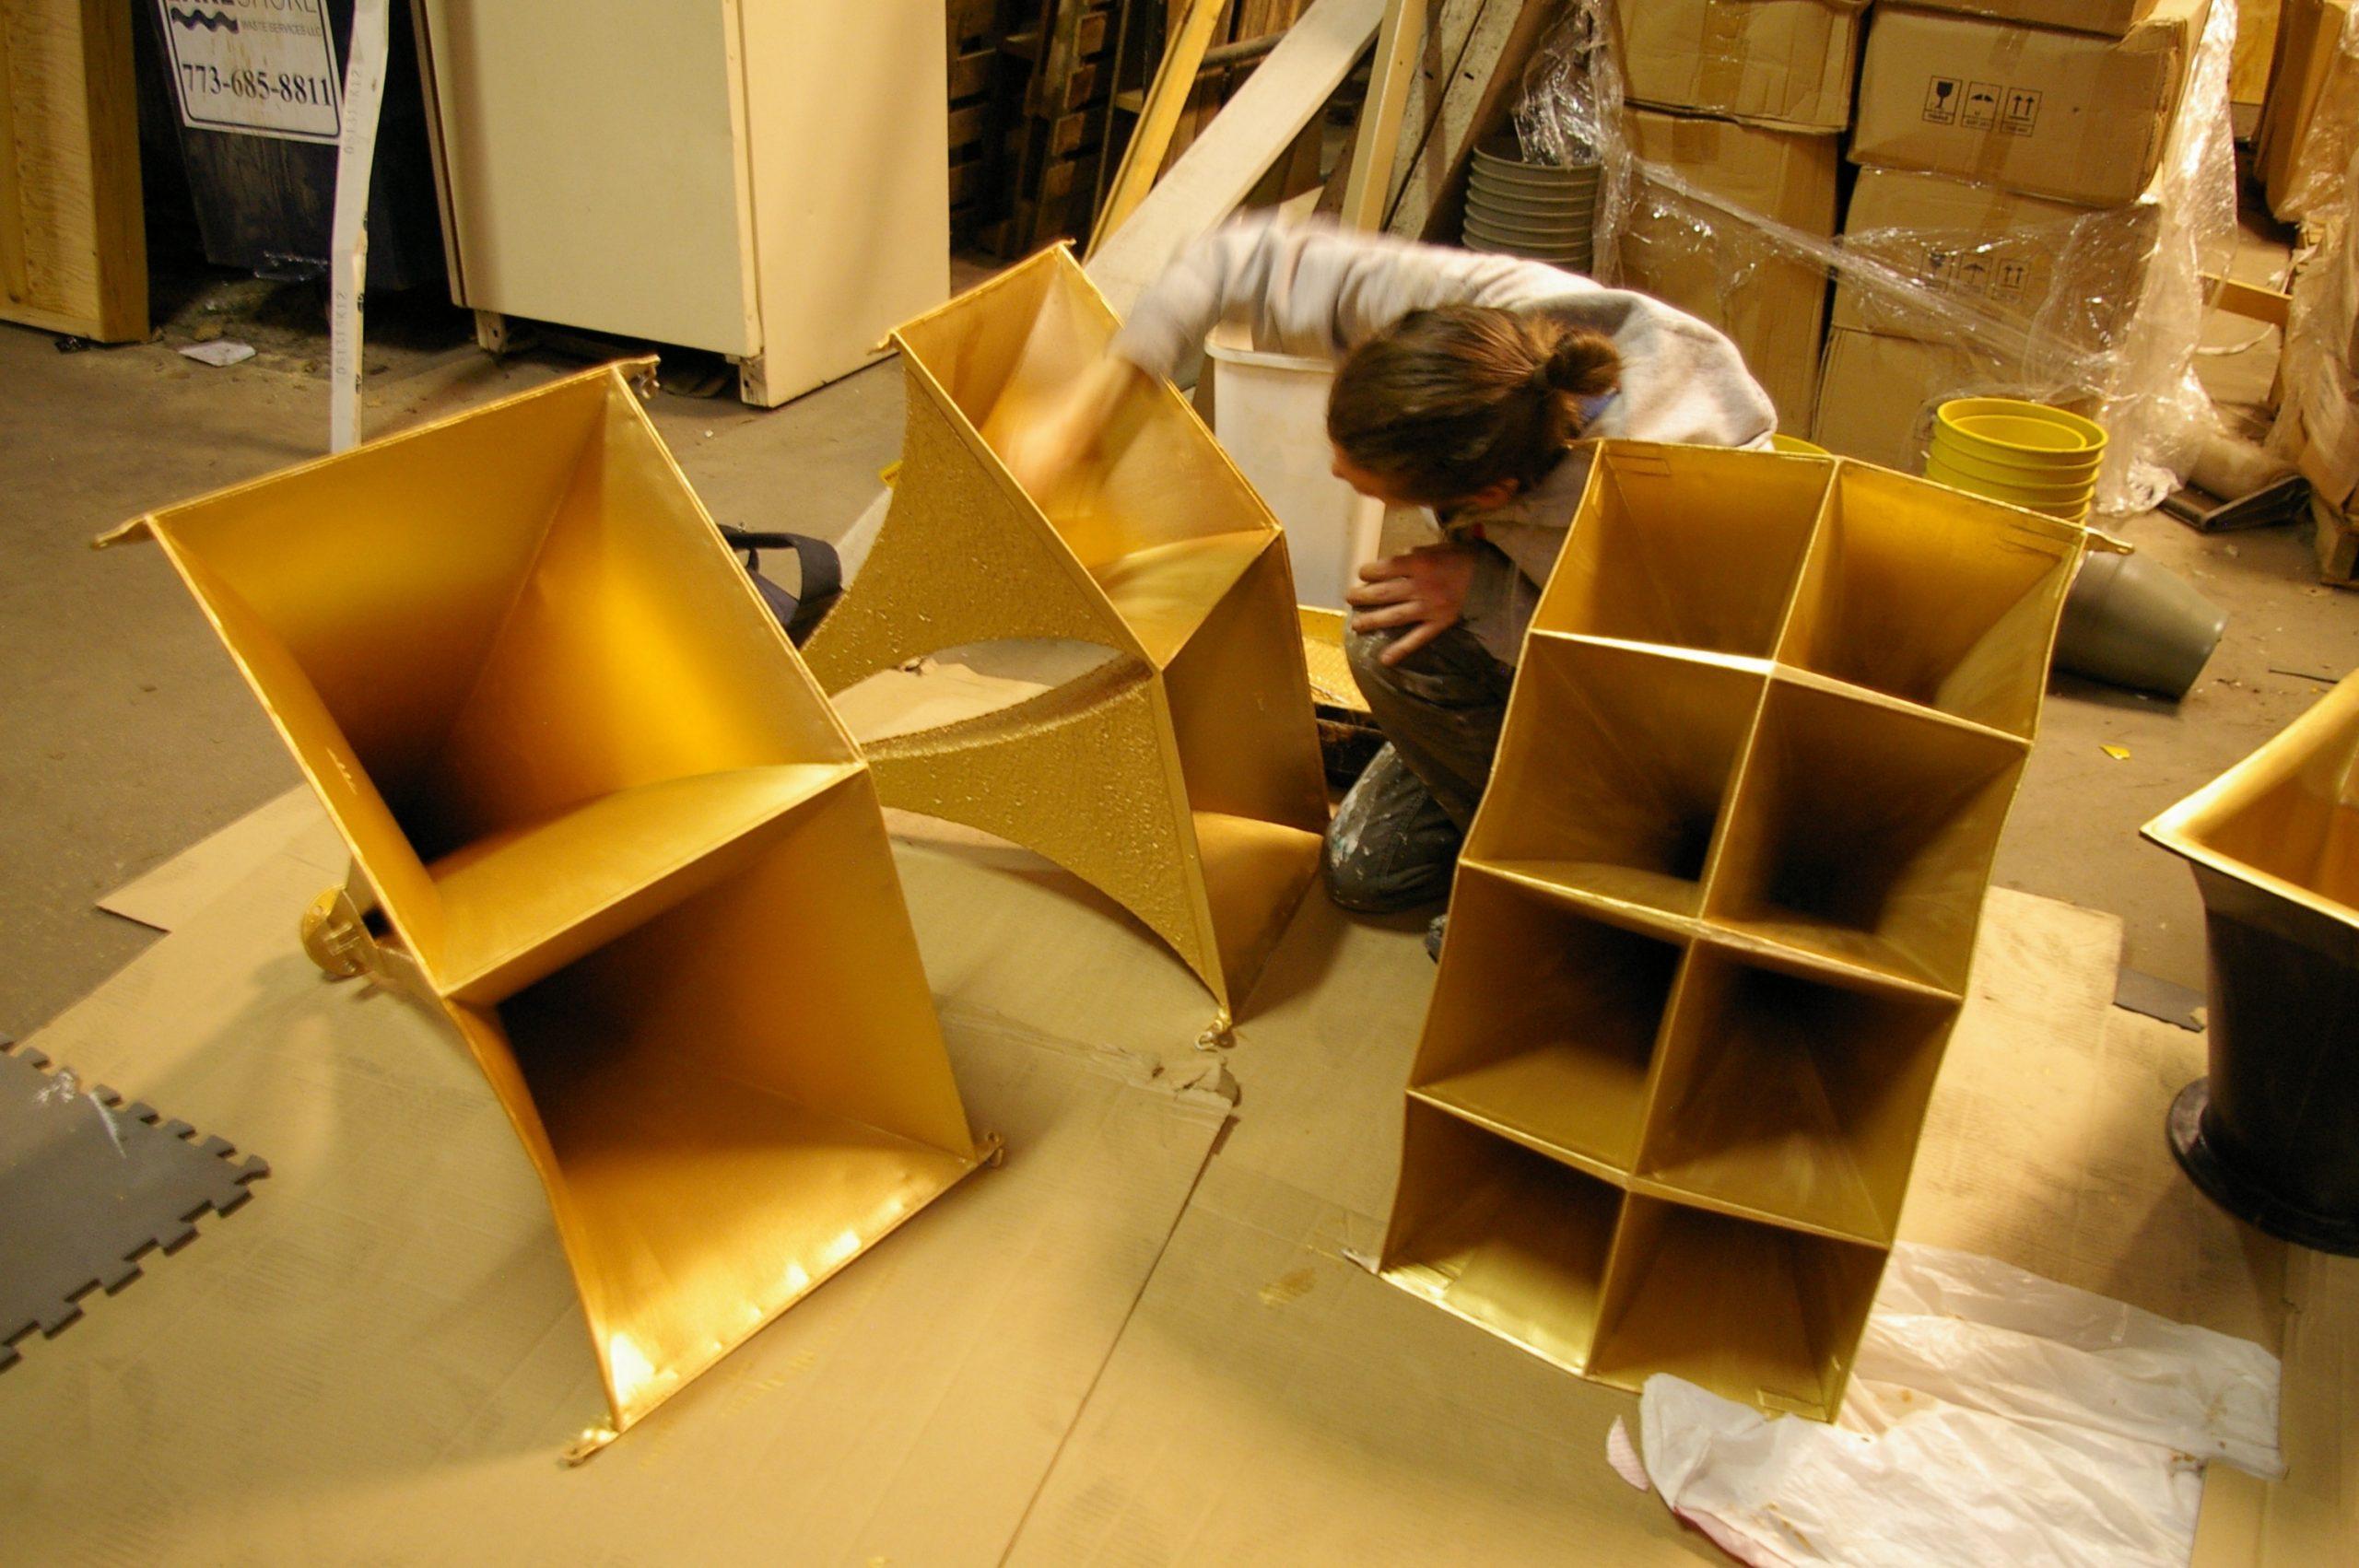 The sound system's golden horns